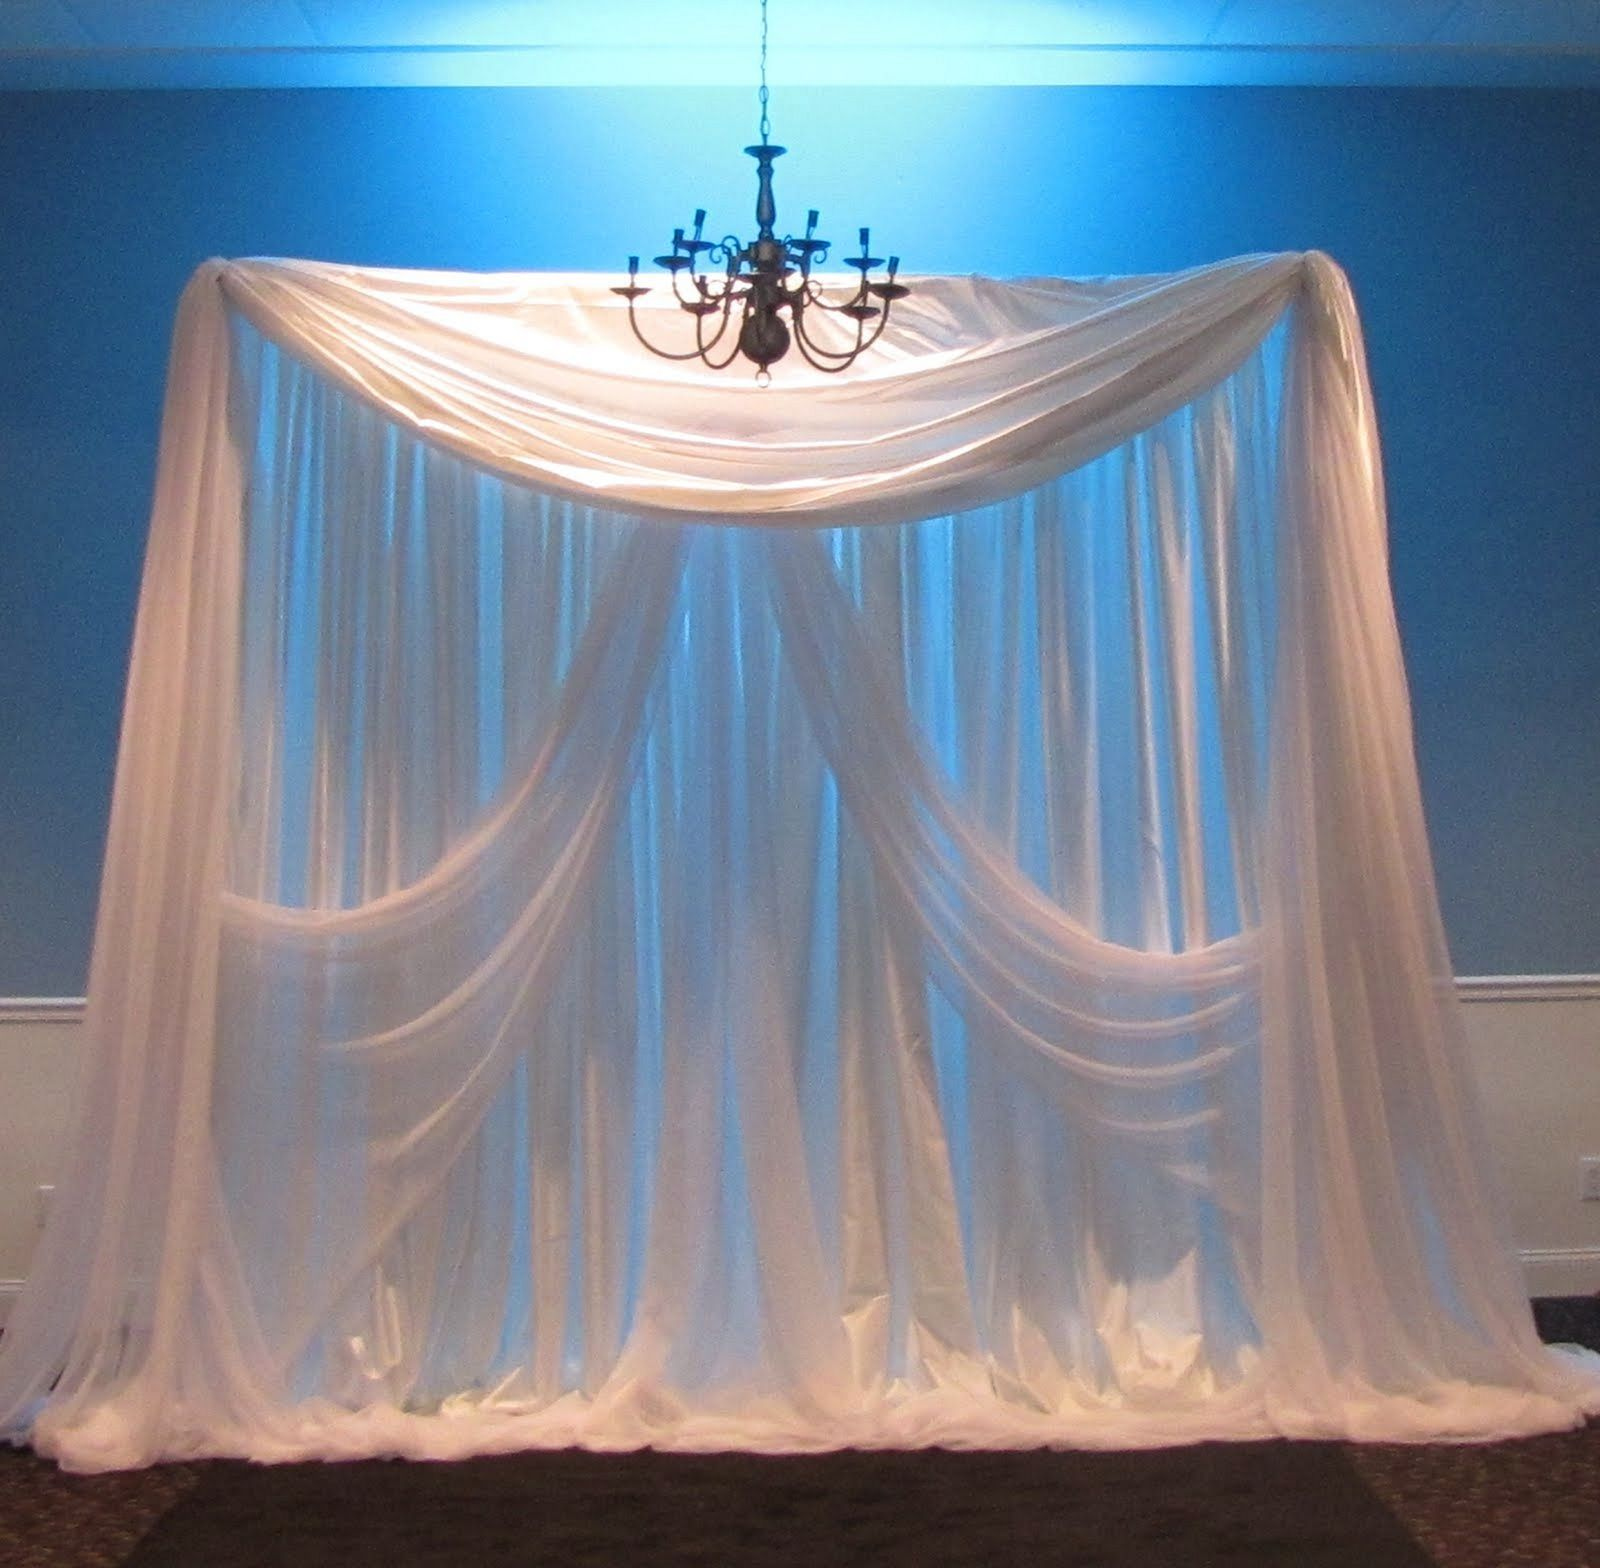 Wedding Altar Backdrops: 40+ Inspiration Backdrop Beautiful Wedding Decorations